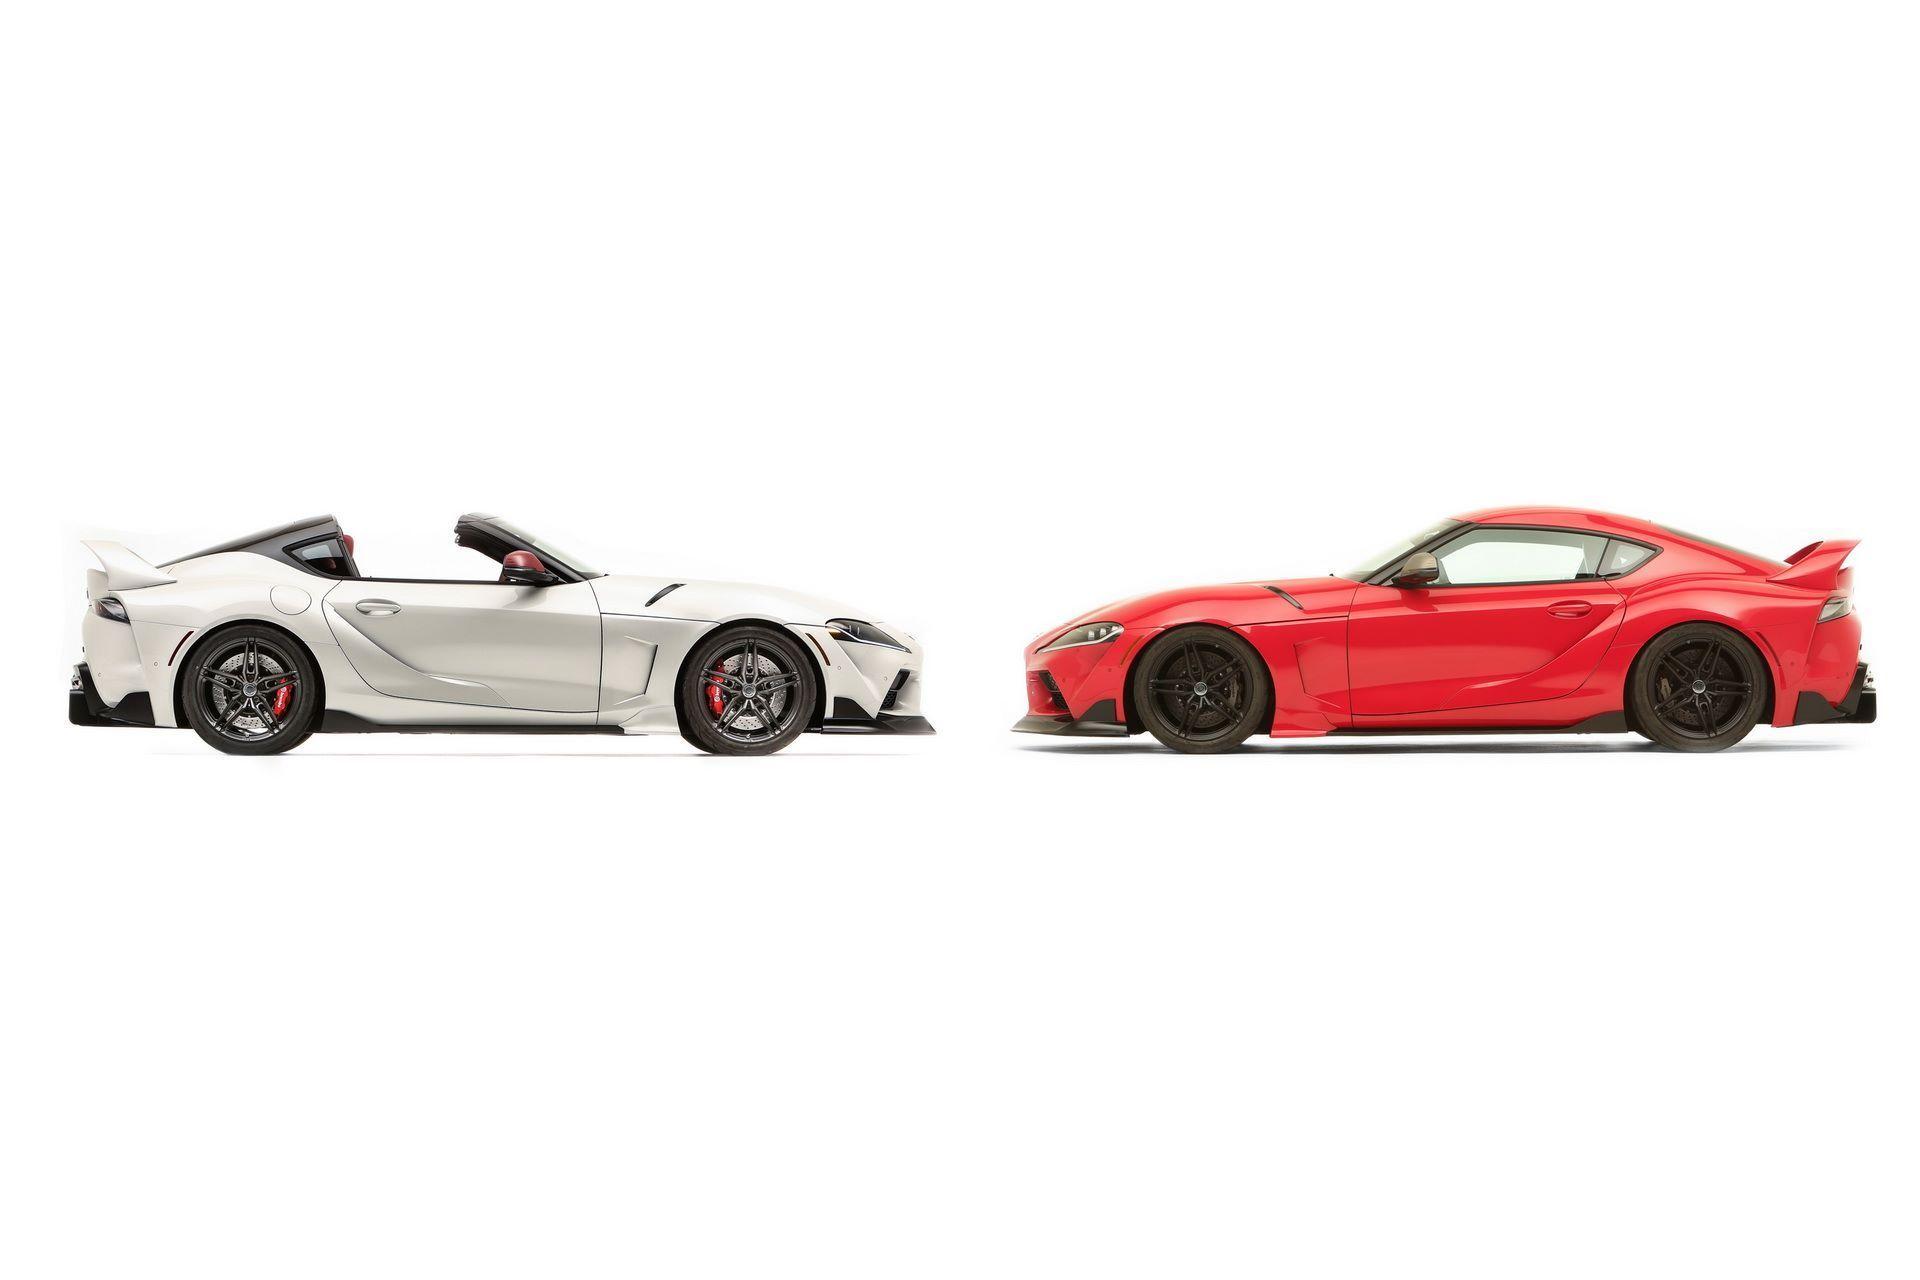 toyota-sema-2020-new-cars-3